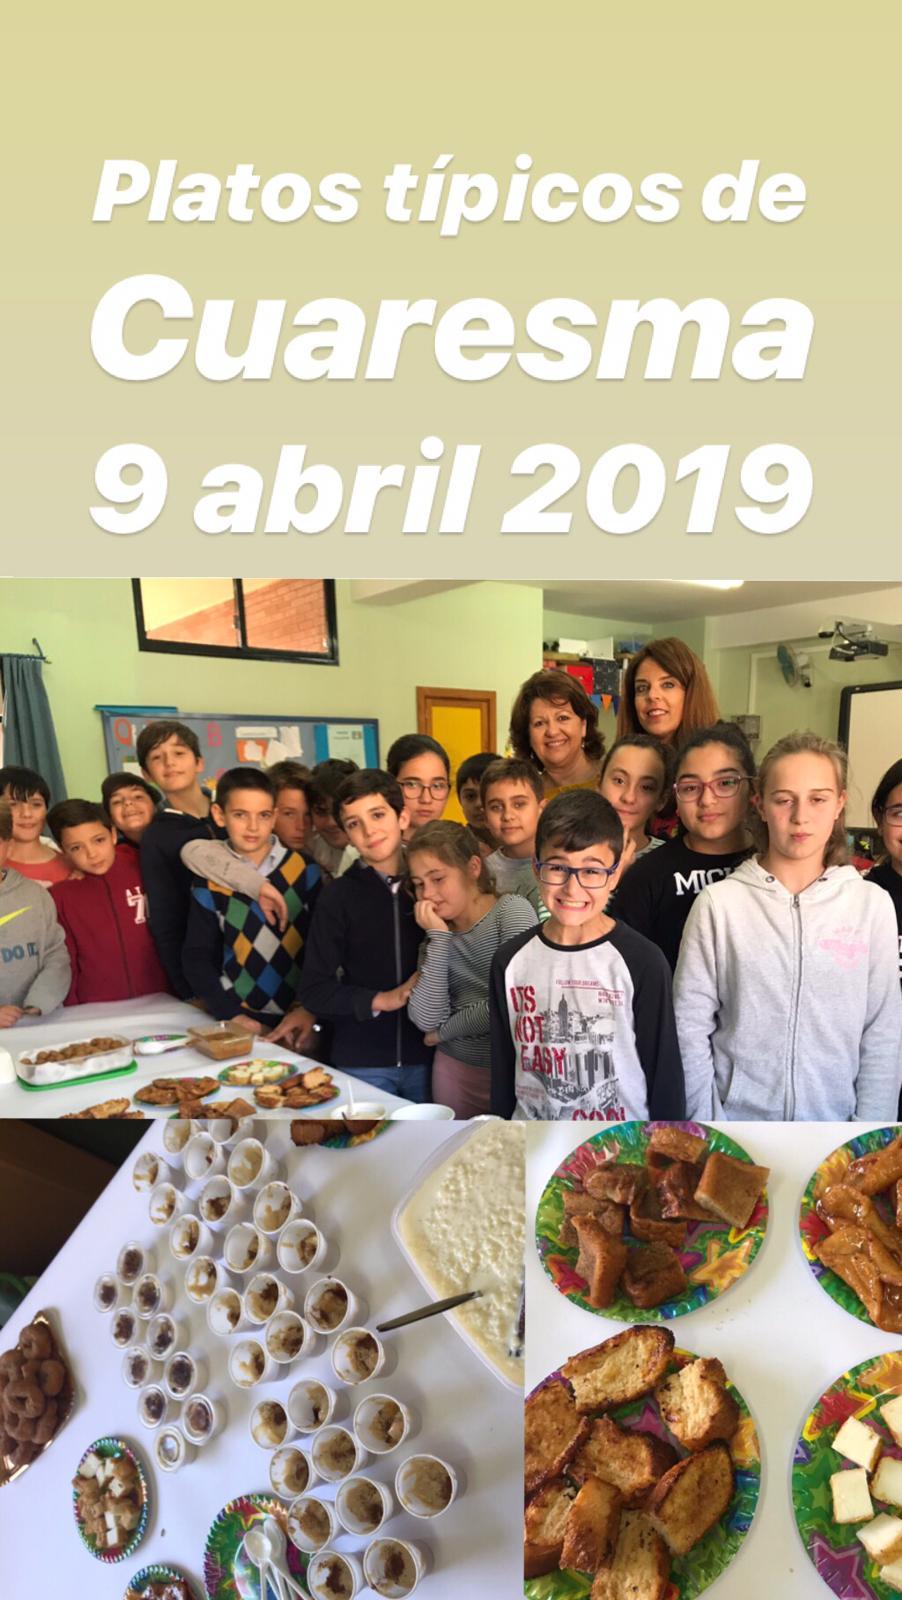 Platos tipicos Cuaresma 2019 2